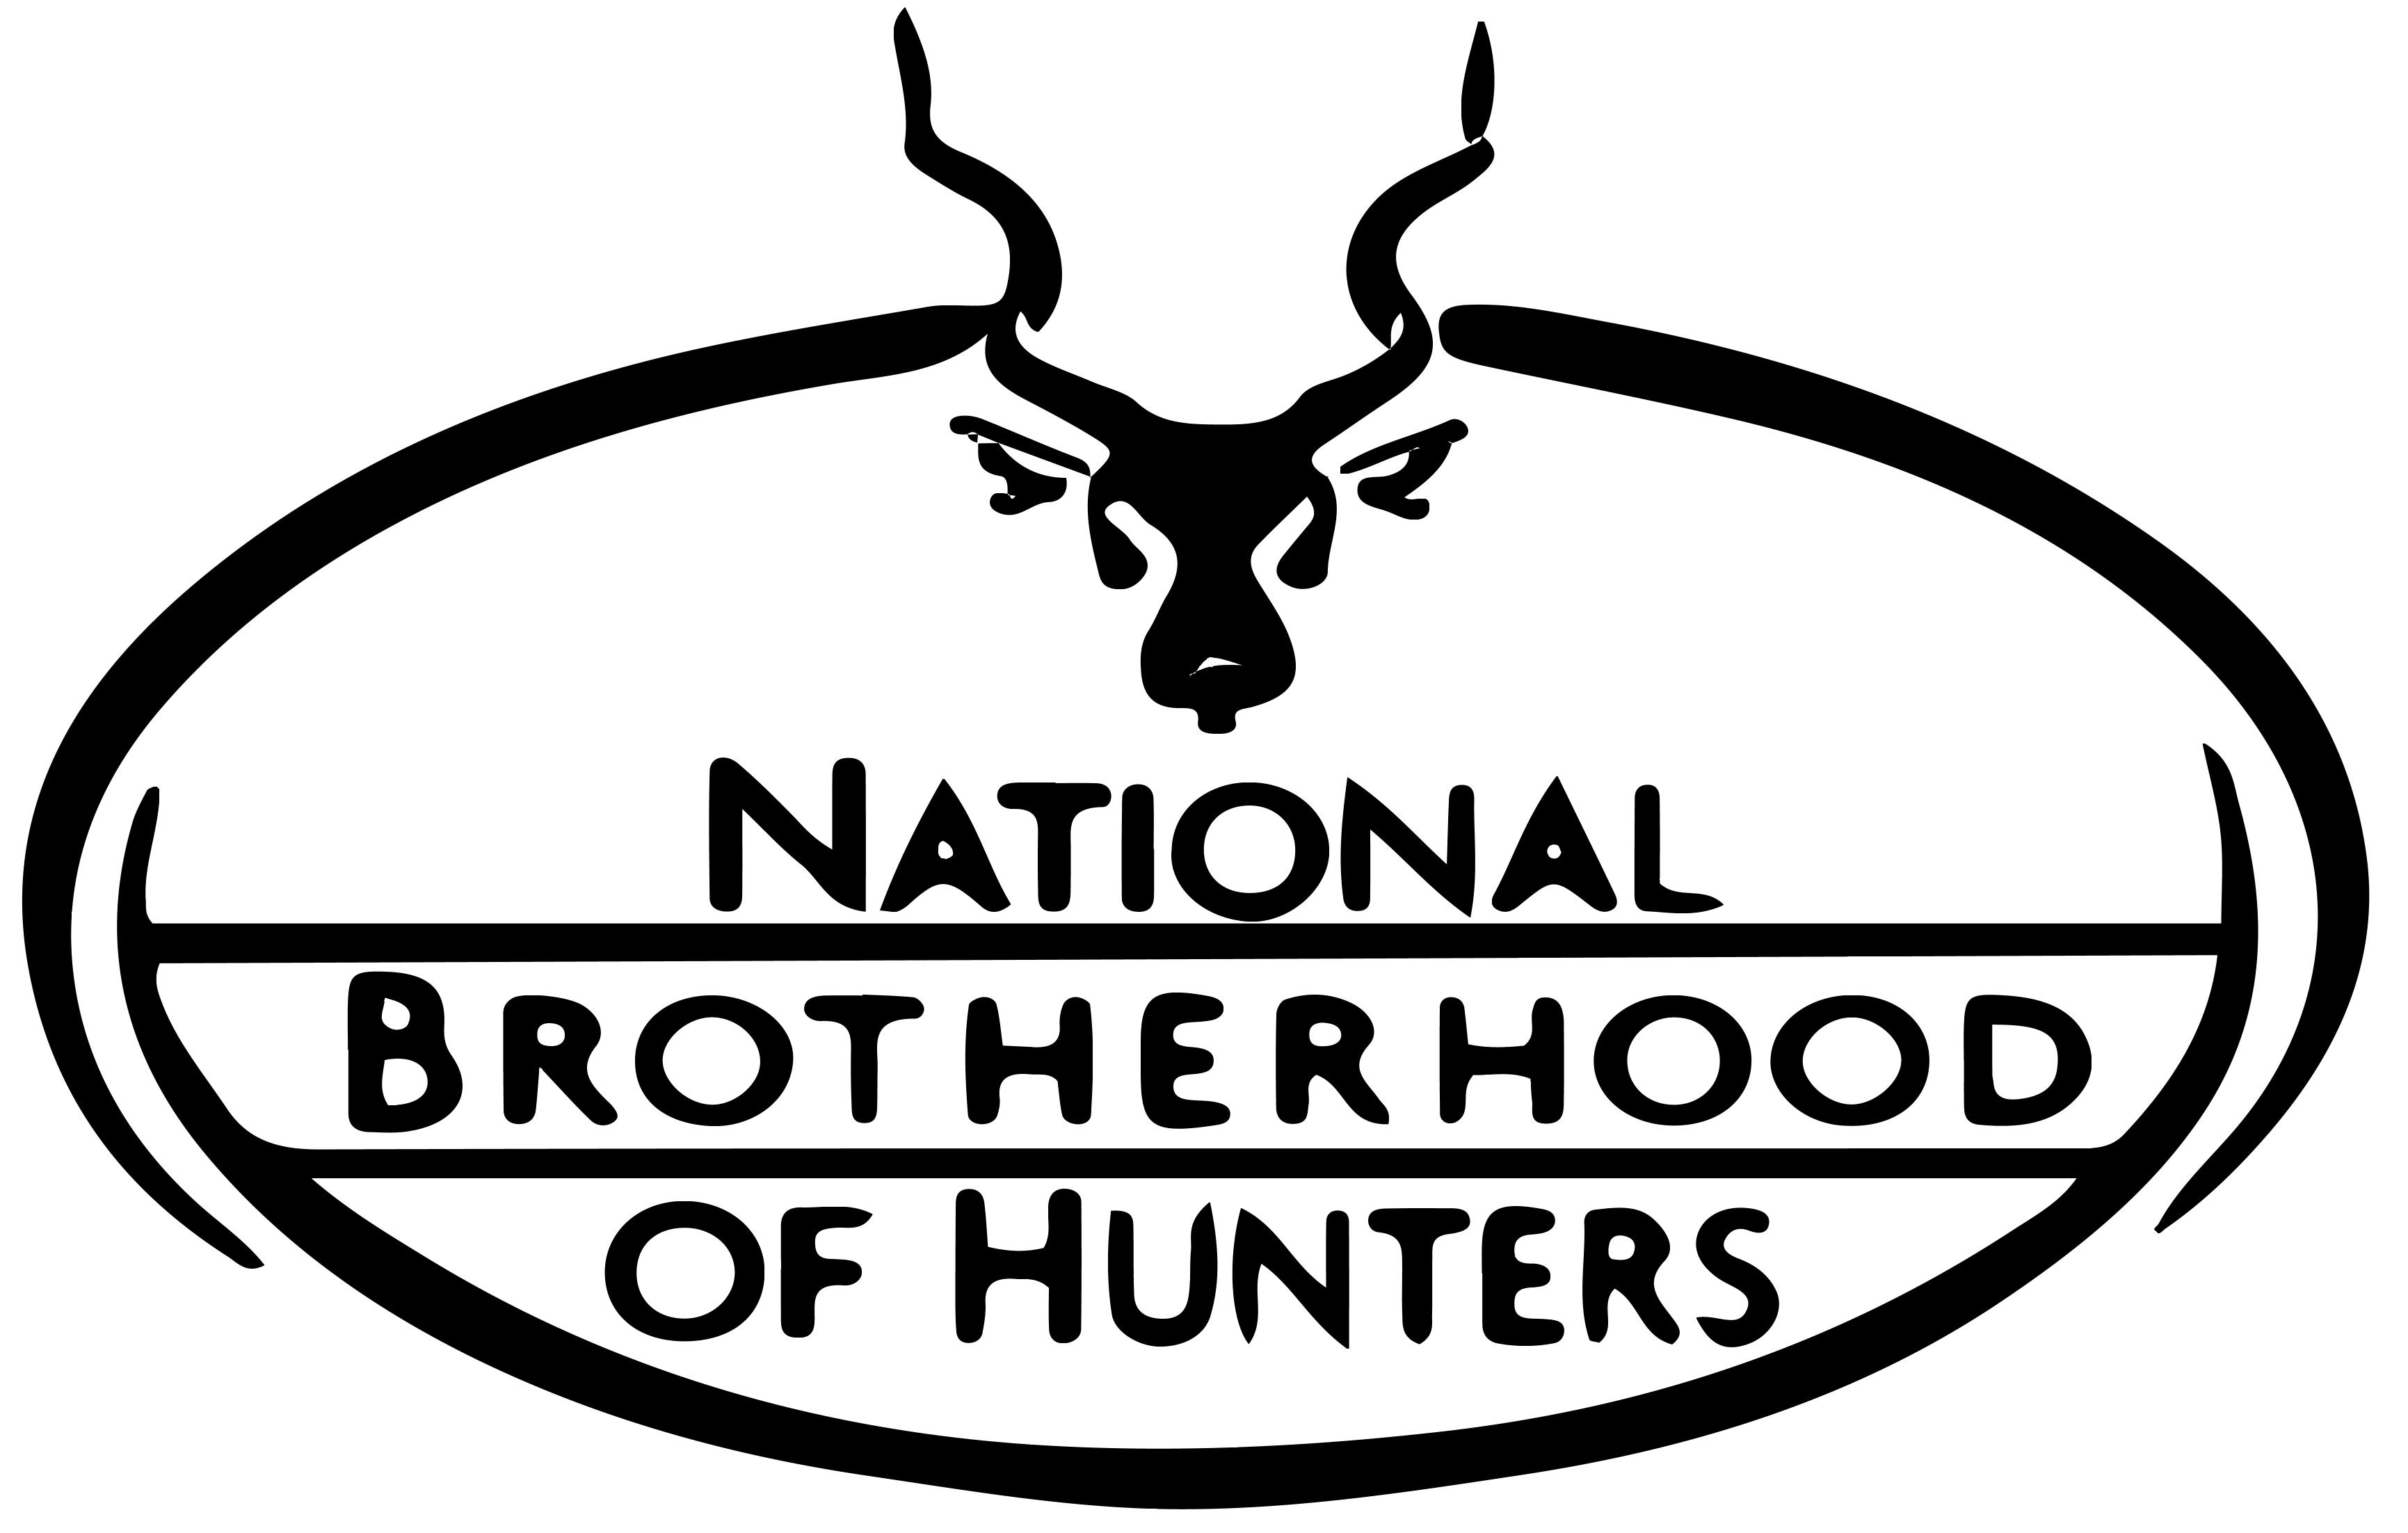 Hunter clipart outdoorsman. National brotherhood of hunters